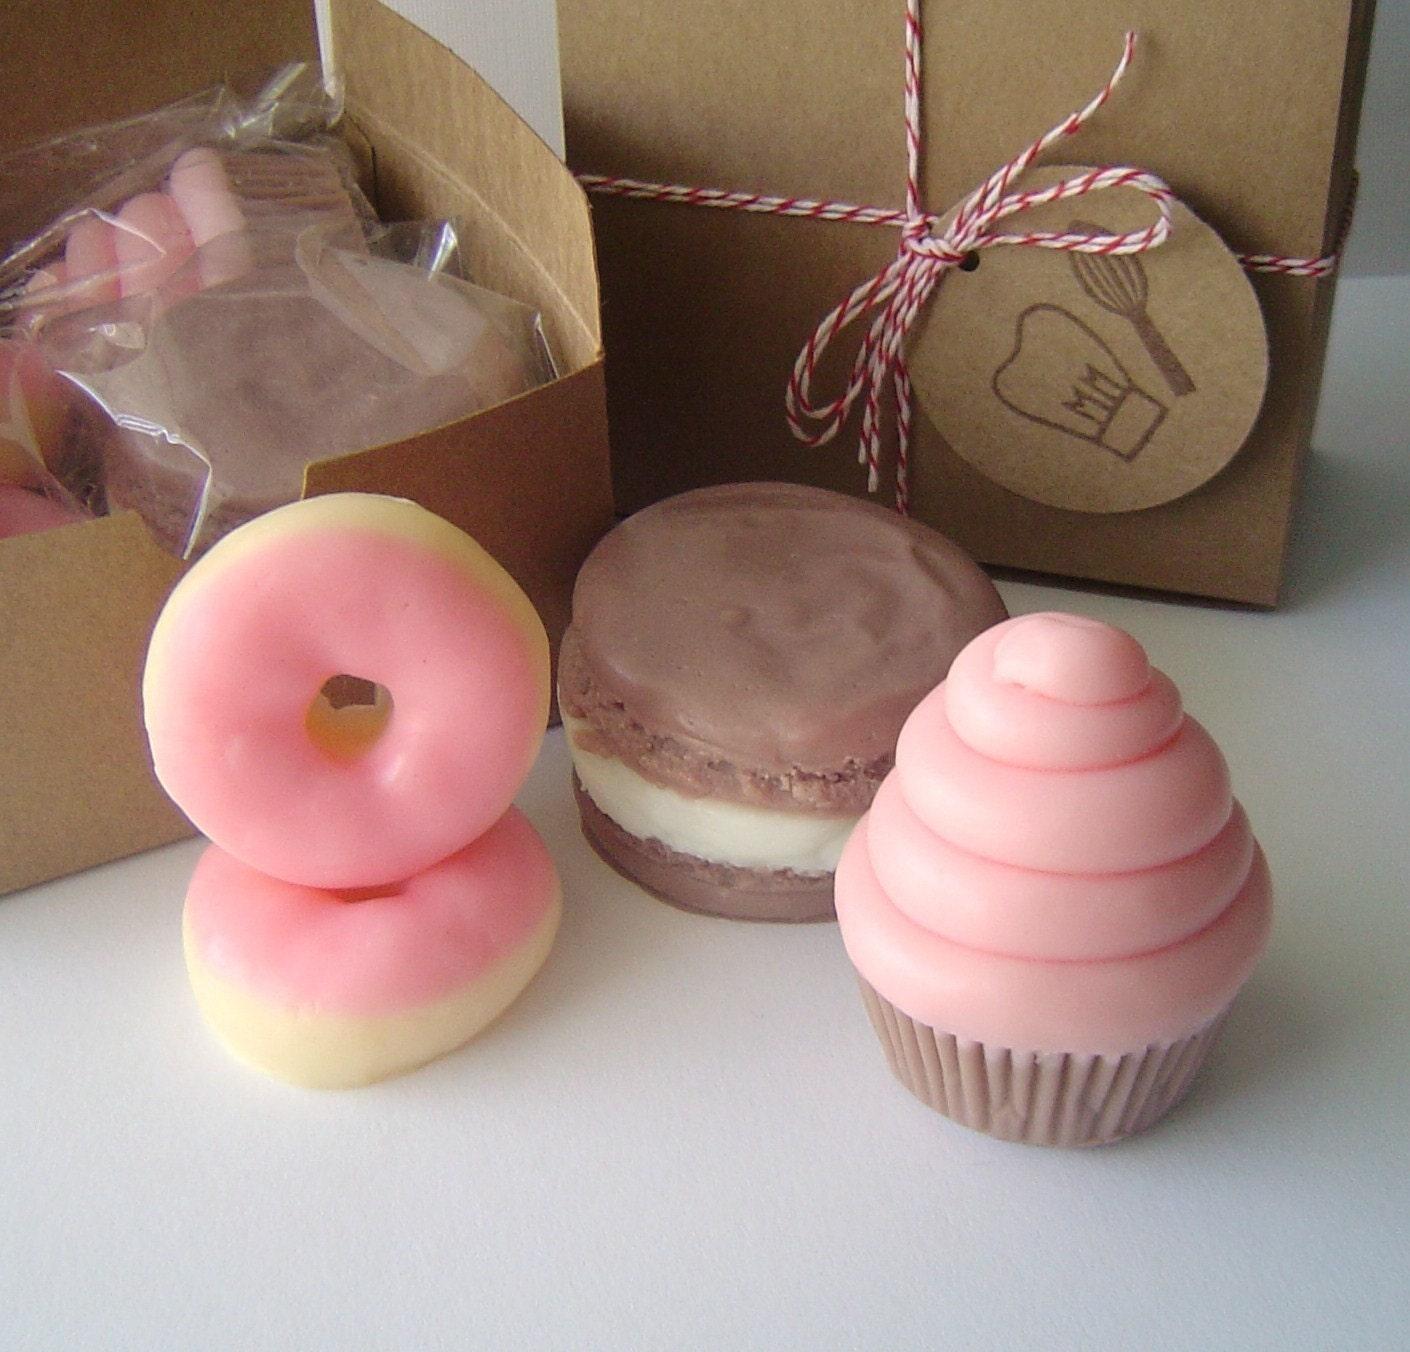 Sweet Treat Gift Set-Raspberry Cream Mini Swirl Cupcake, Chocolate Cream Cheese French Macaron, Frosted Strawberry Mini Donuts-Goat's Milk Soap